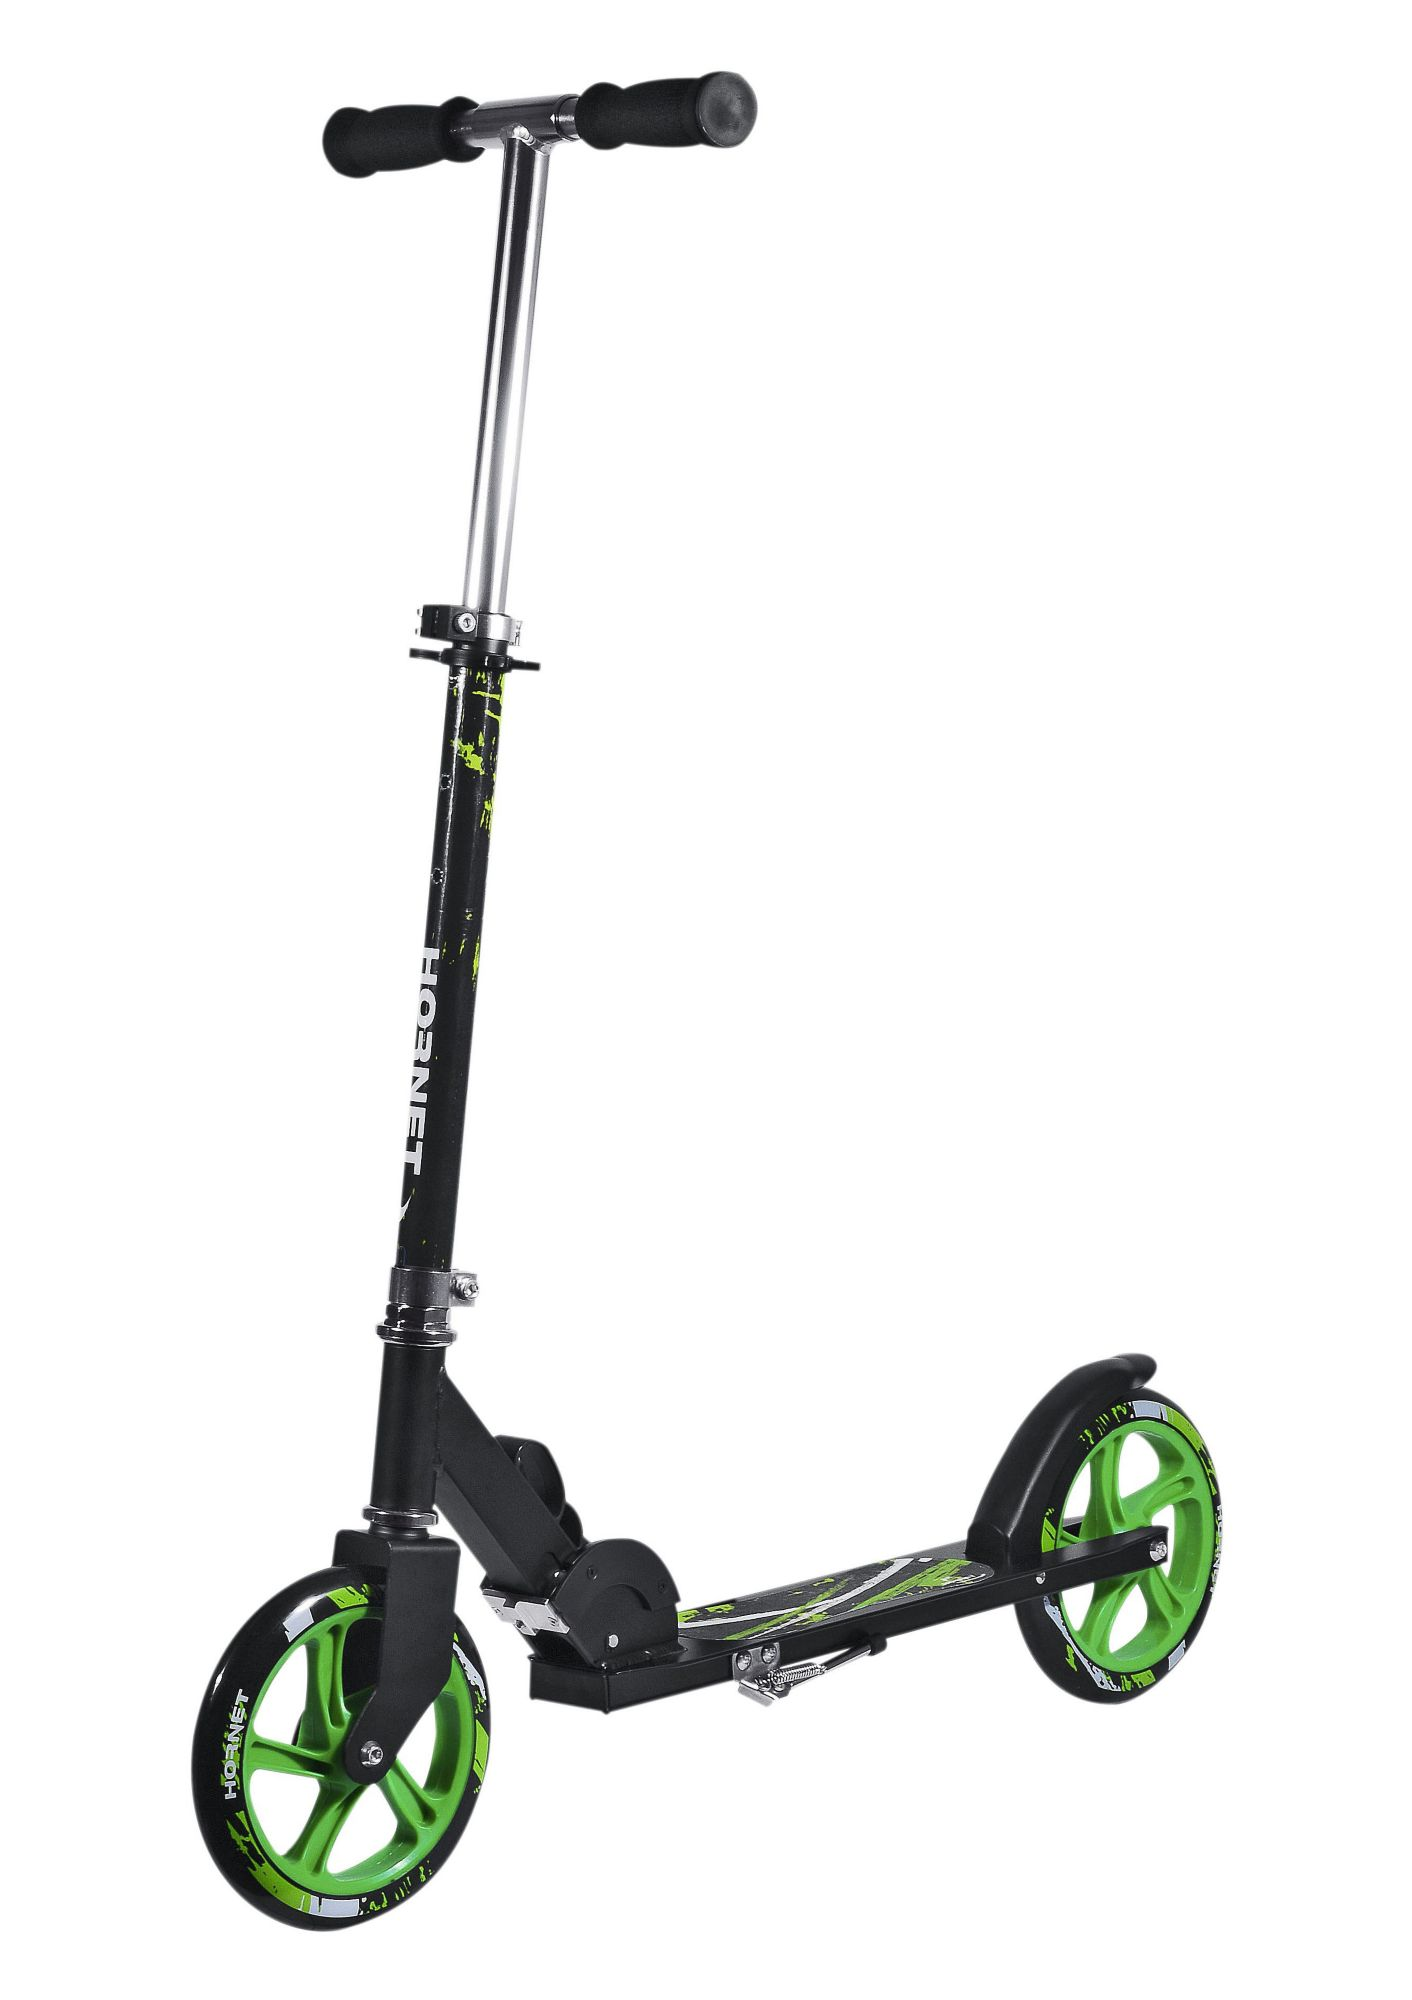 HUDORA Alu-Scooter, Hudora, »Hornet 205«, schwarz-grün